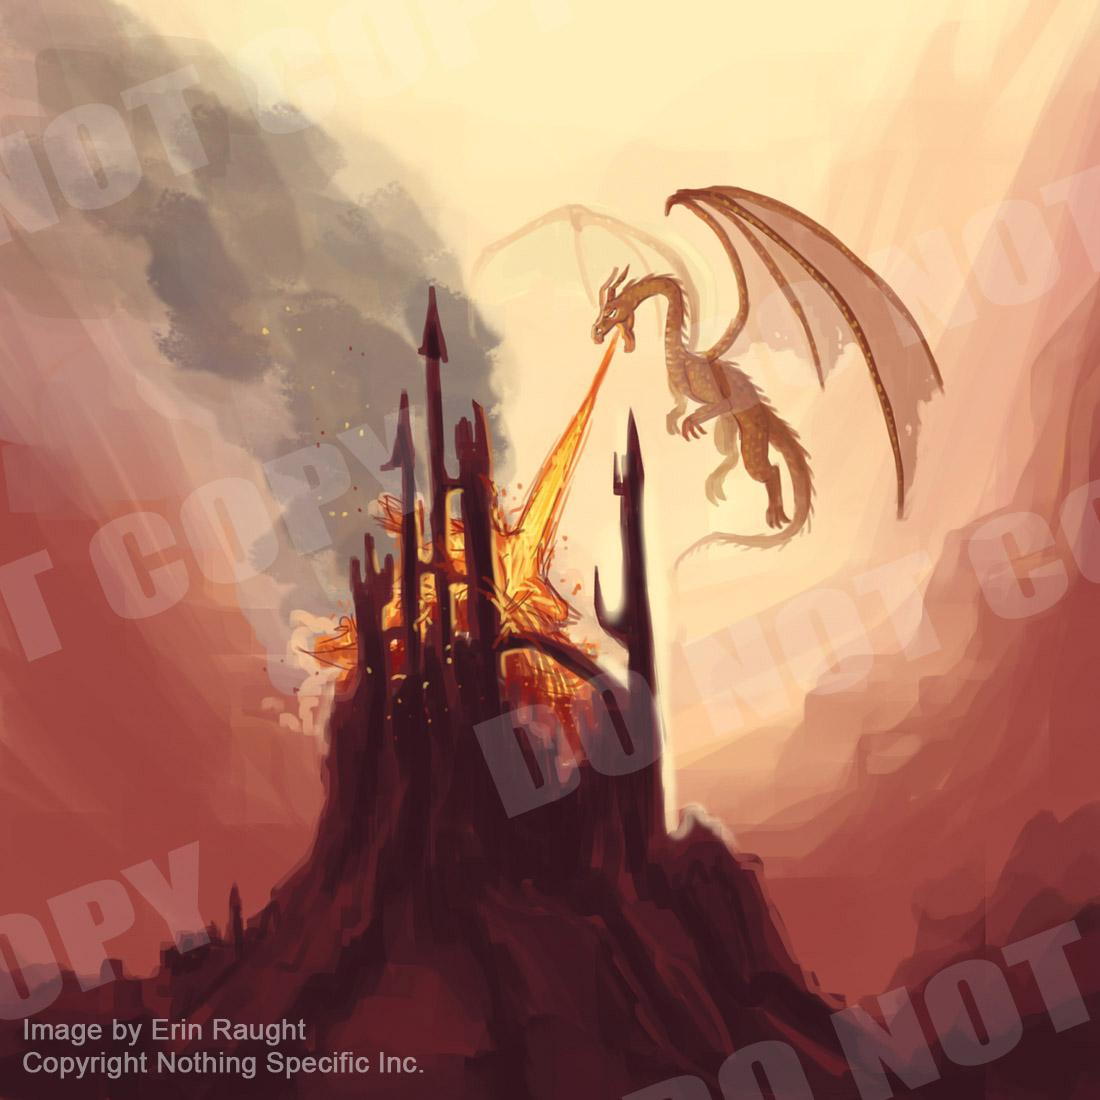 7134 - Dragon Breathing Fire - Castle - Ruins - Fantasy - Medieval.jpg